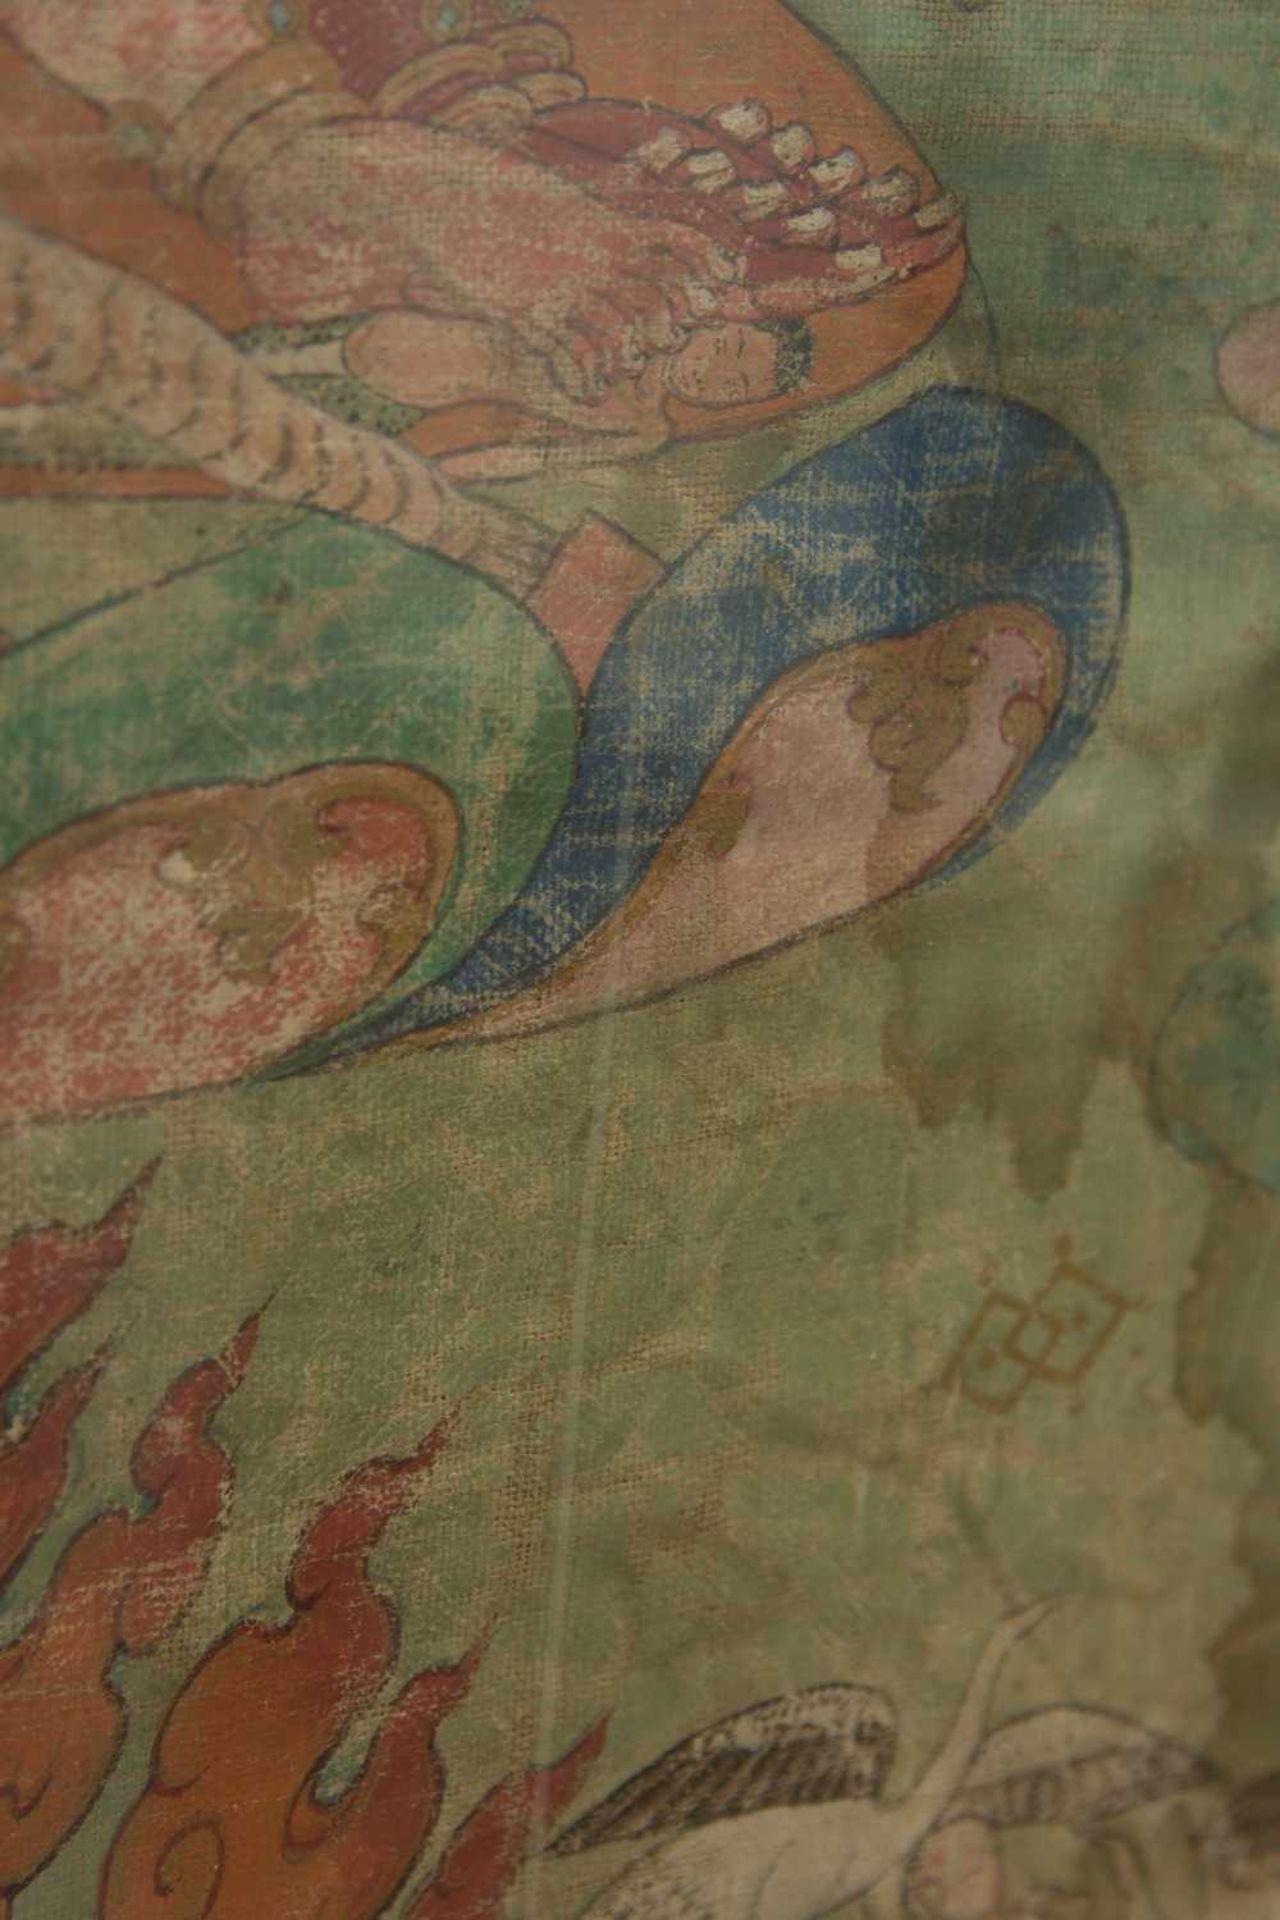 Los 7 - THANGKA MAHAKALA TANZT, Seide auf Leinen, Tibet, spätes 19. Jahrhundert. Antiker Thangka mit